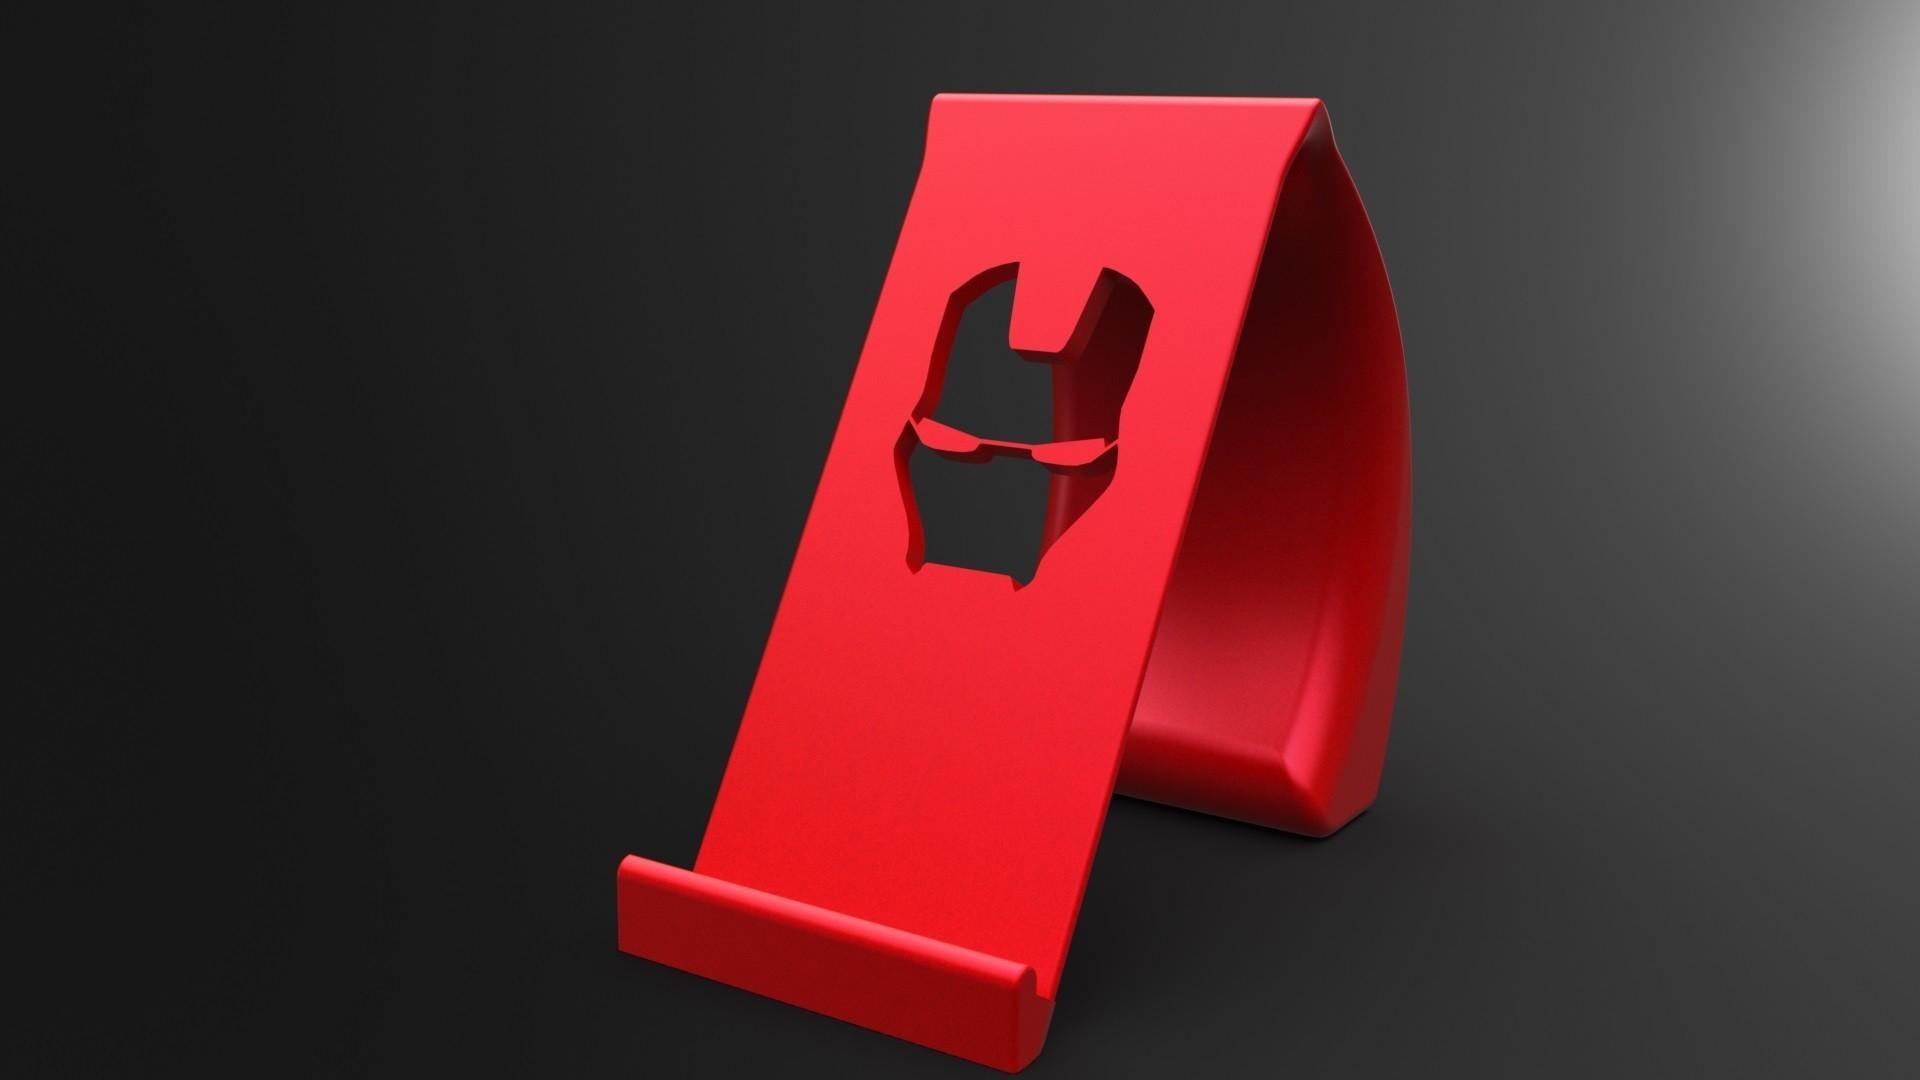 ironman2.jpg Download STL file Ironman Phone Holder • 3D print model, IceKiwi